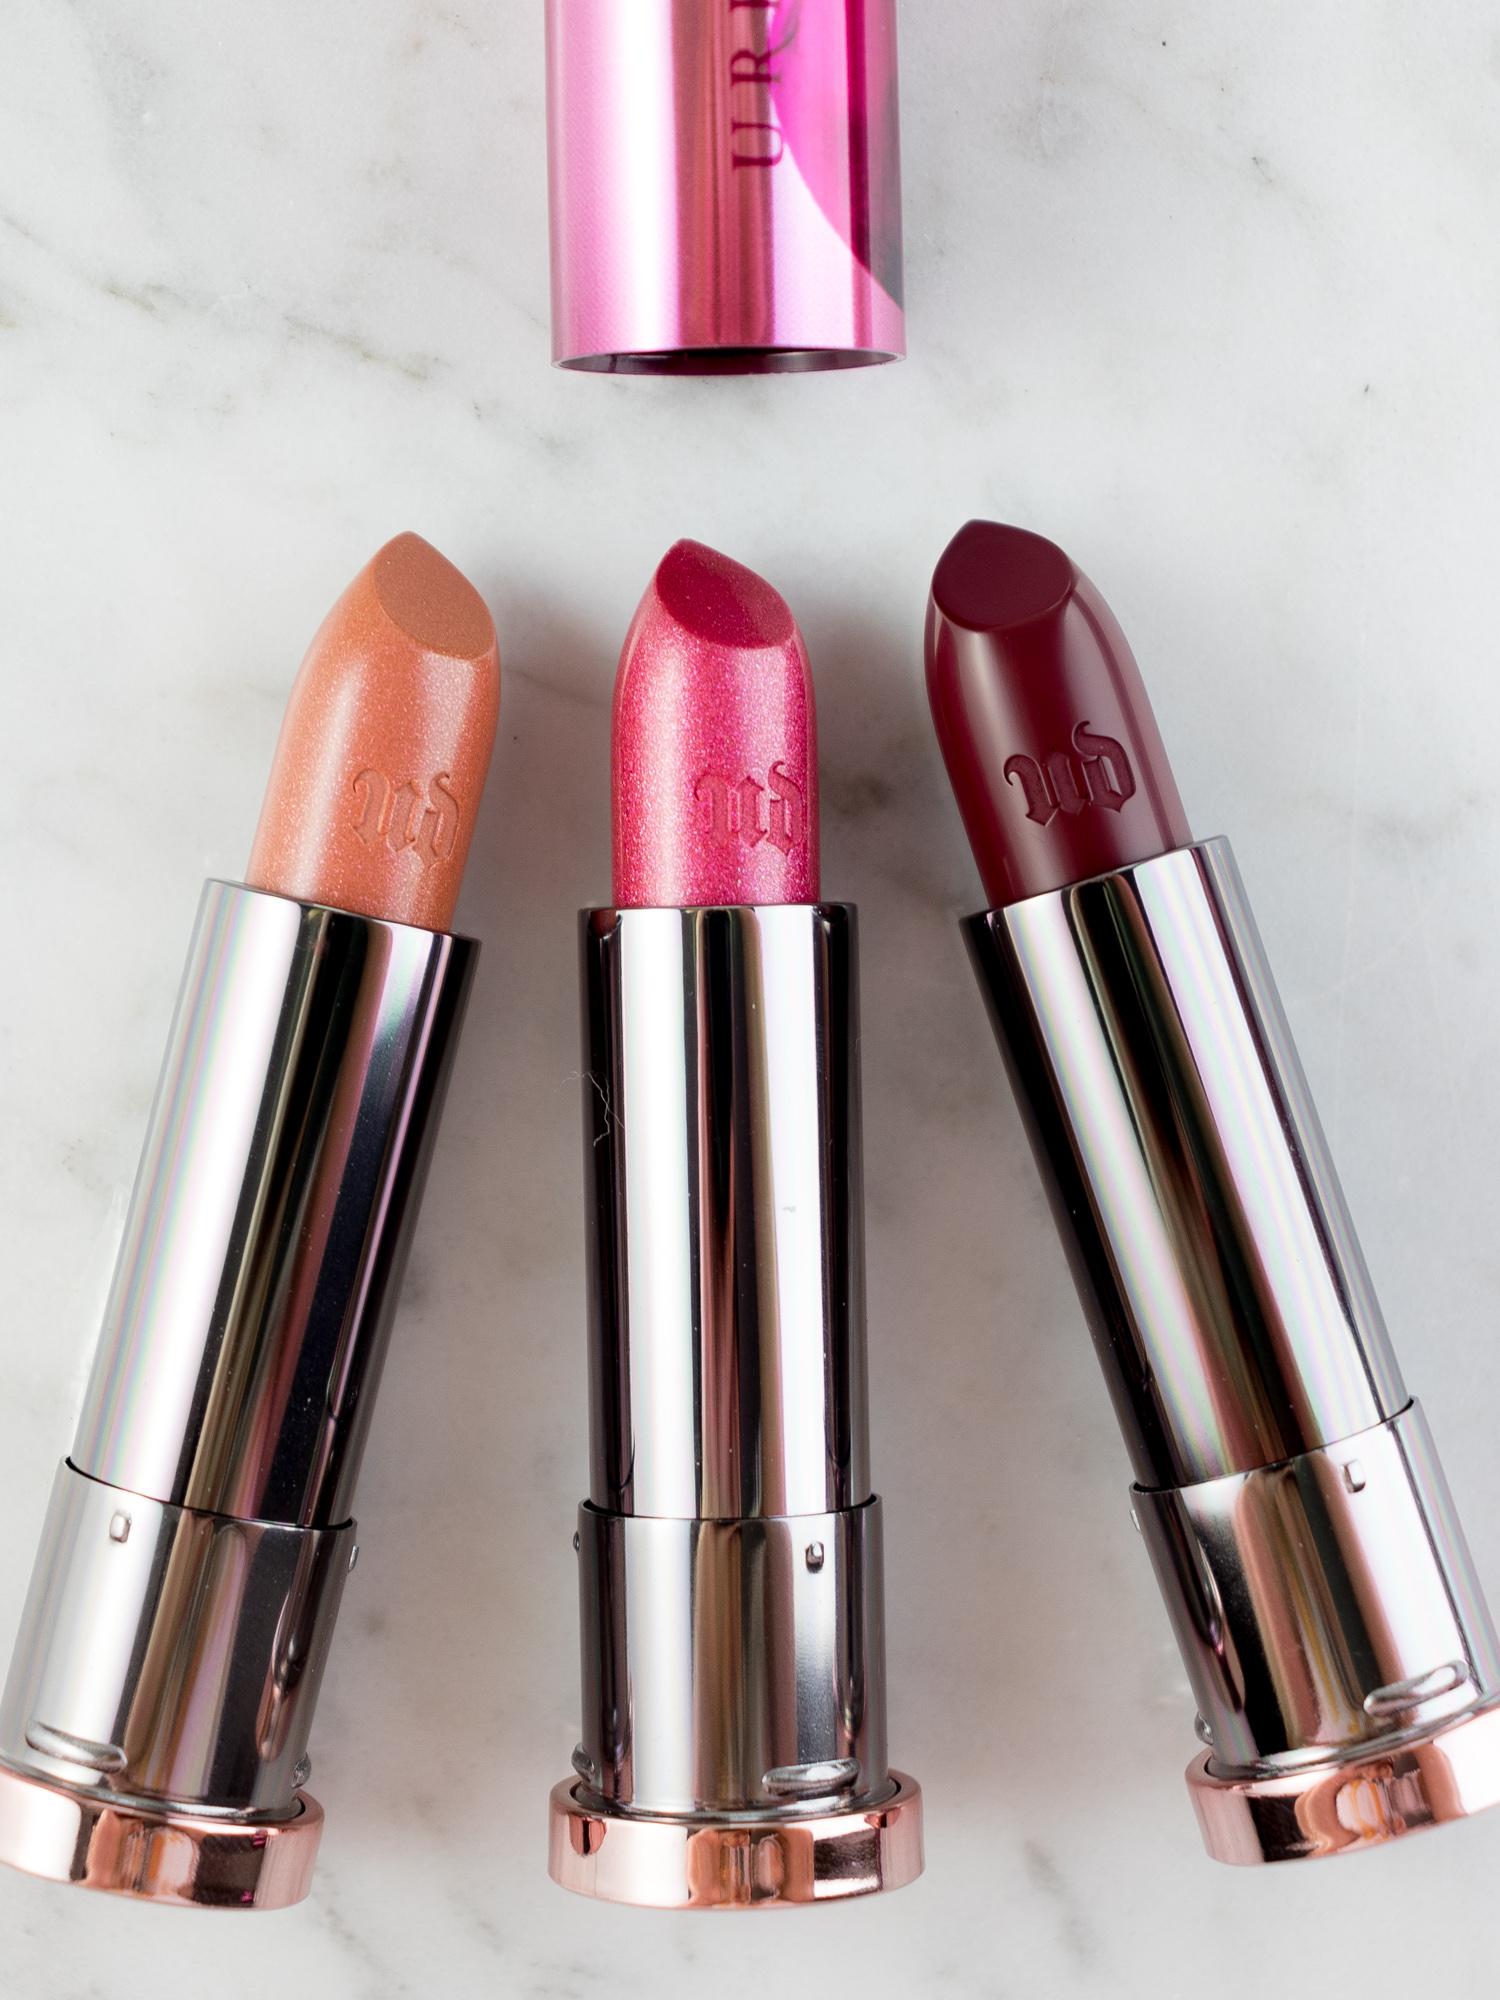 Urban Decay NAKED Cherry Lipsticks